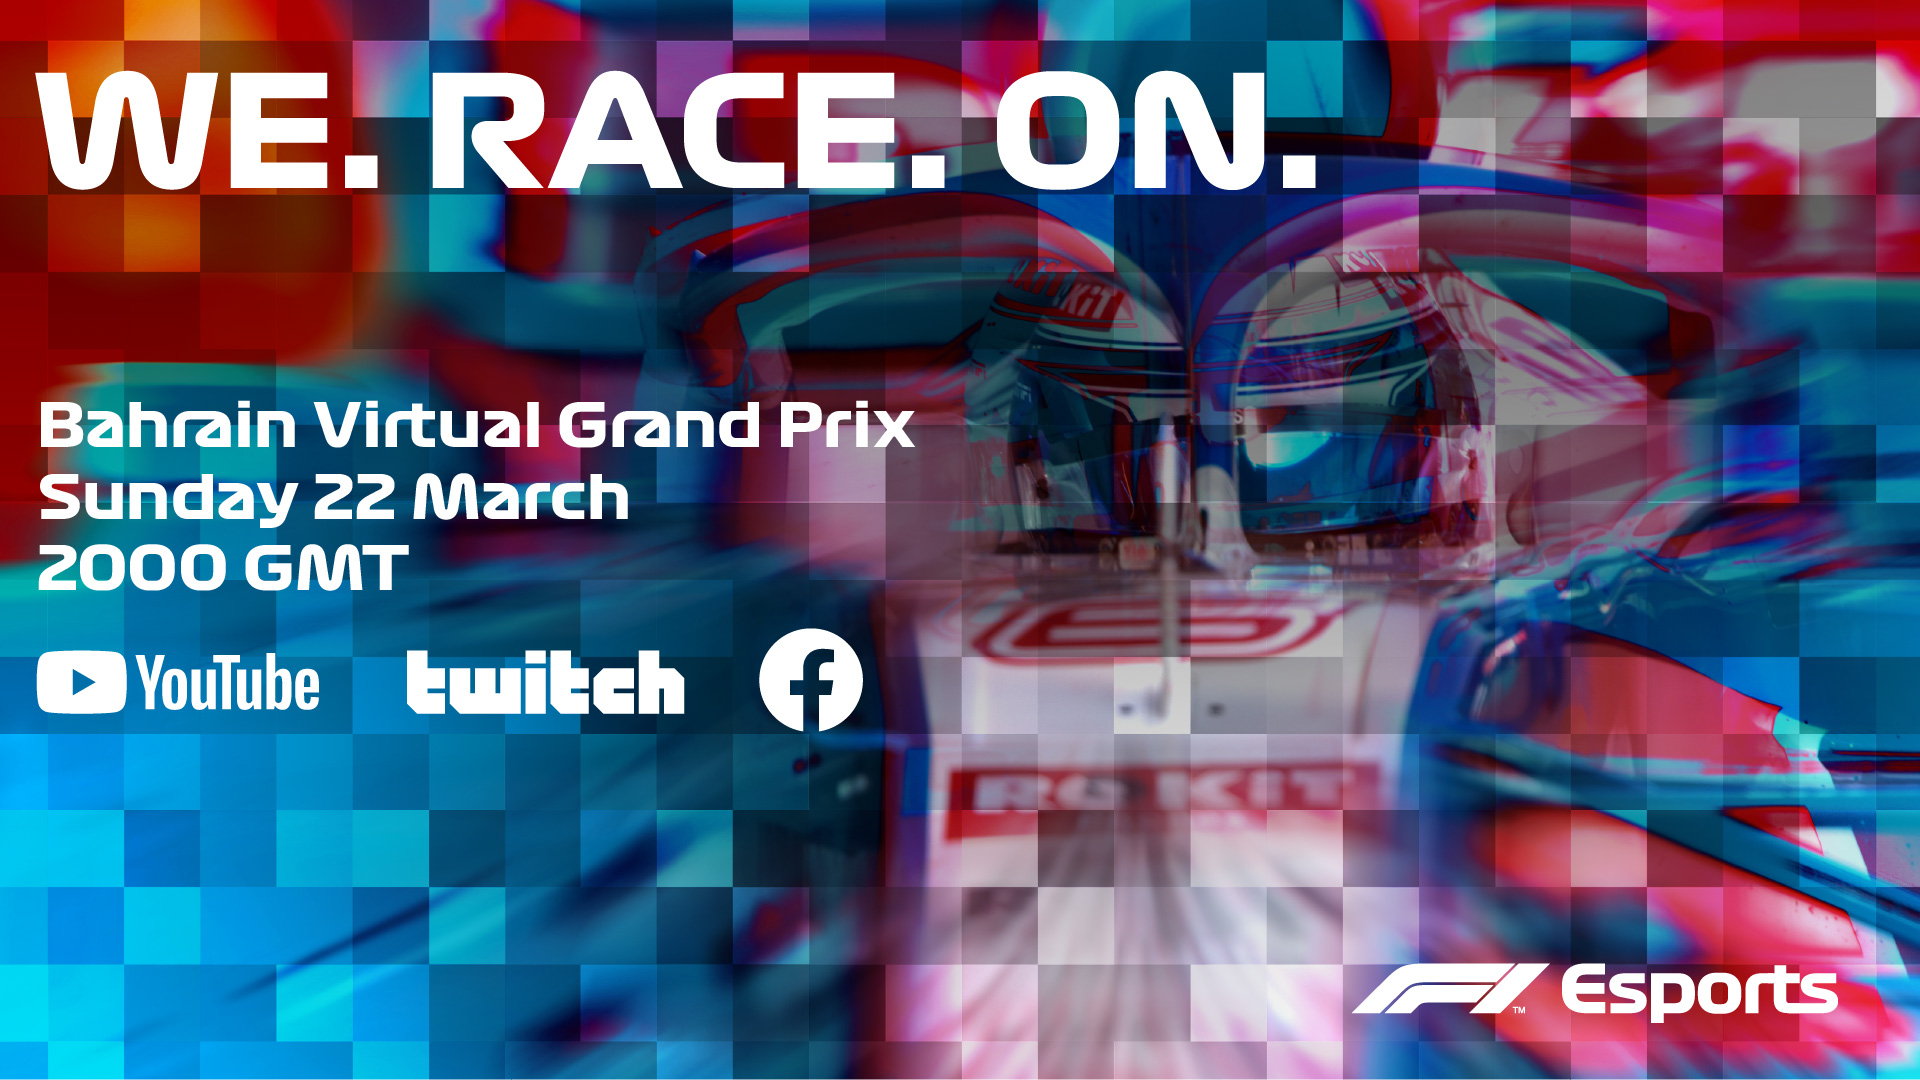 La F1 lance un championnat virtuel